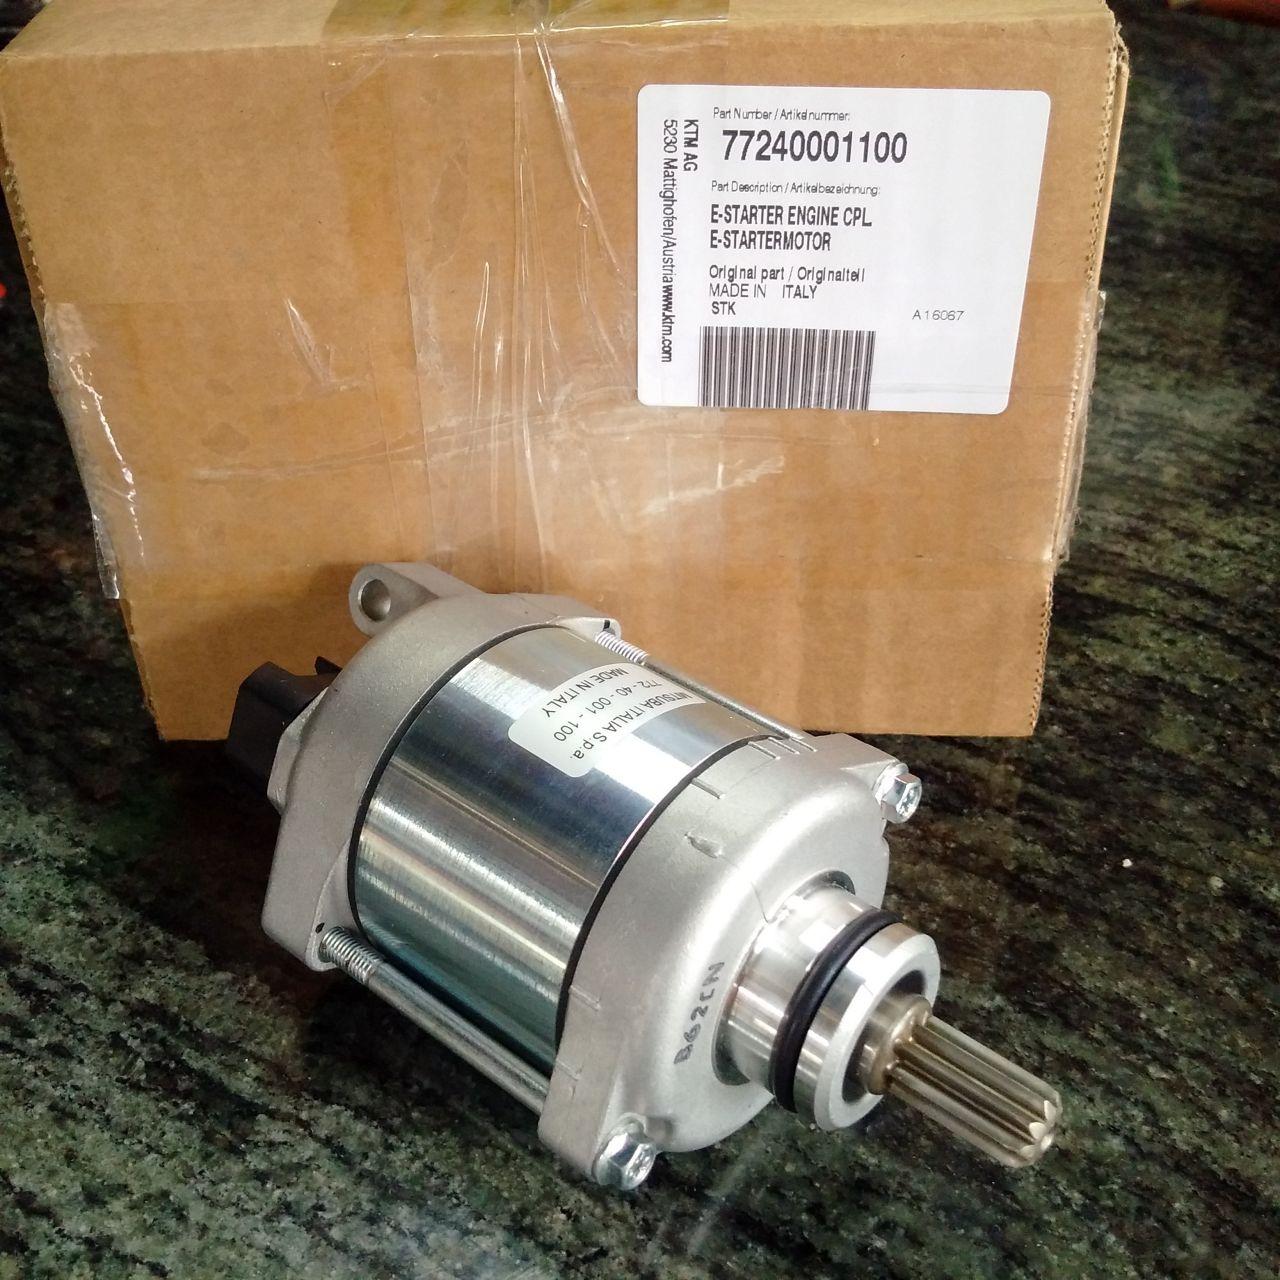 wpid wp 14809994617941 JualDinamo starter ktm 250/350 e starter engine cpl Rp.4,900,000